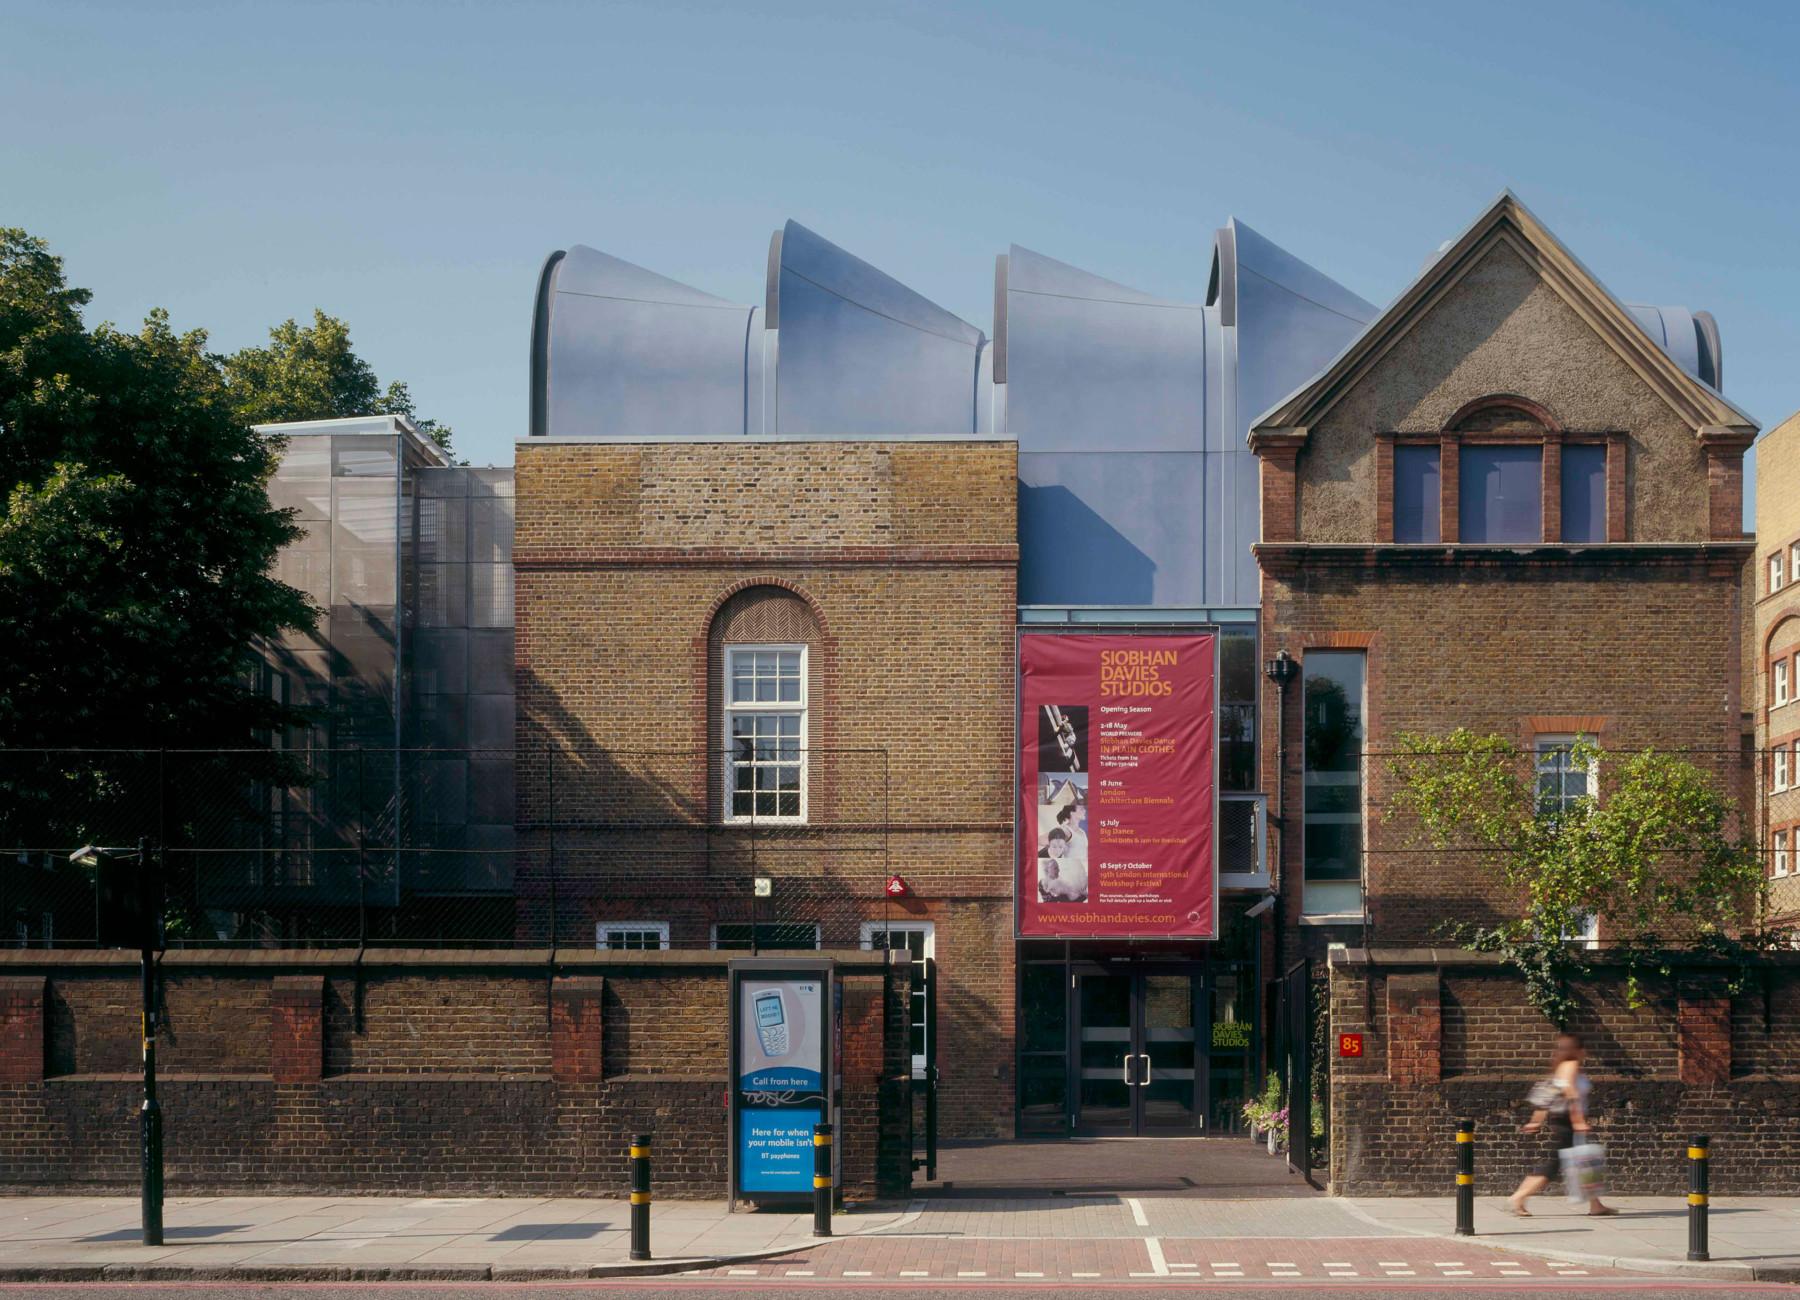 Sarah-Wigglesworth-Architects Siobhan-Davies-Dance Street 3600